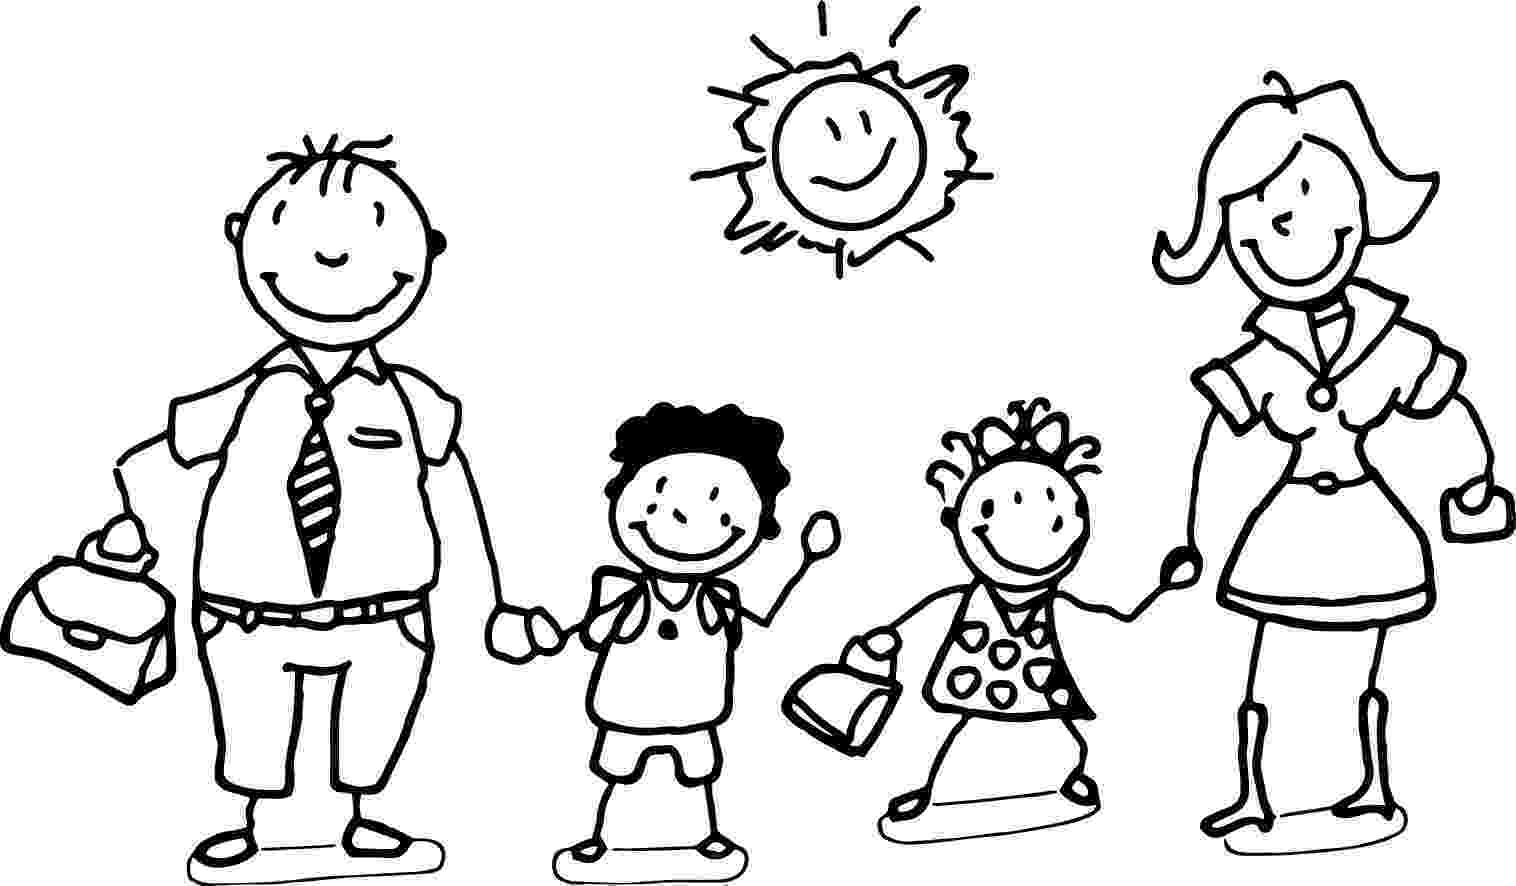 family coloring pages family coloring pages coloring pages to download and print coloring pages family